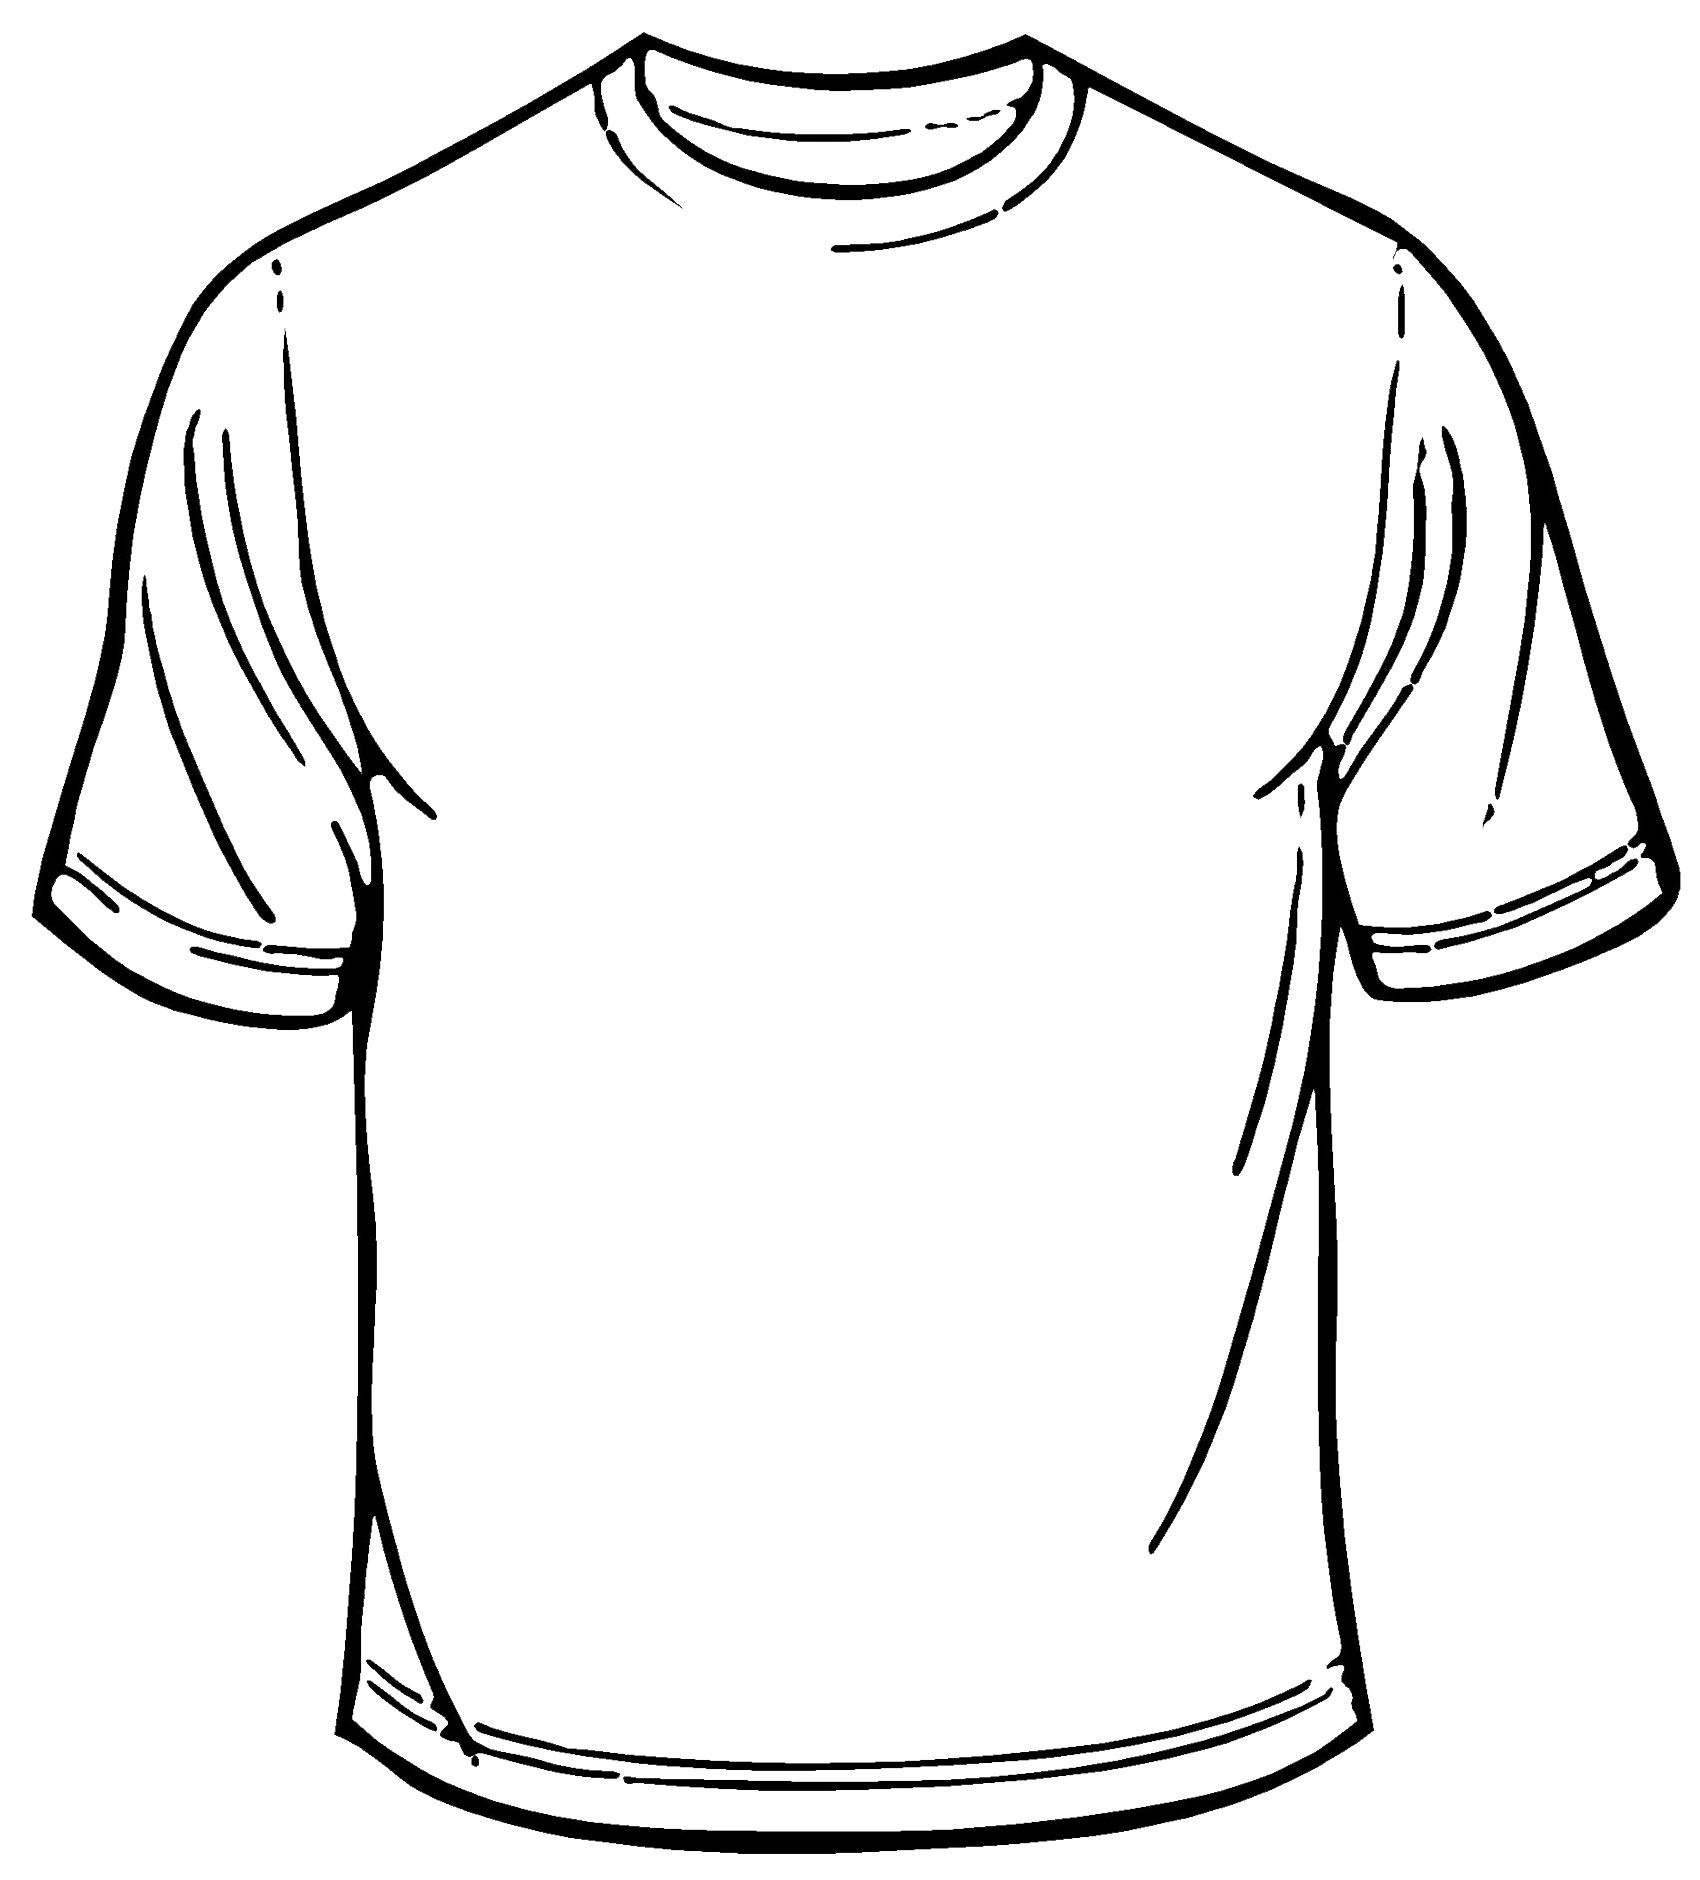 Design t shirt png - Blank T Shirt Png Image 30266